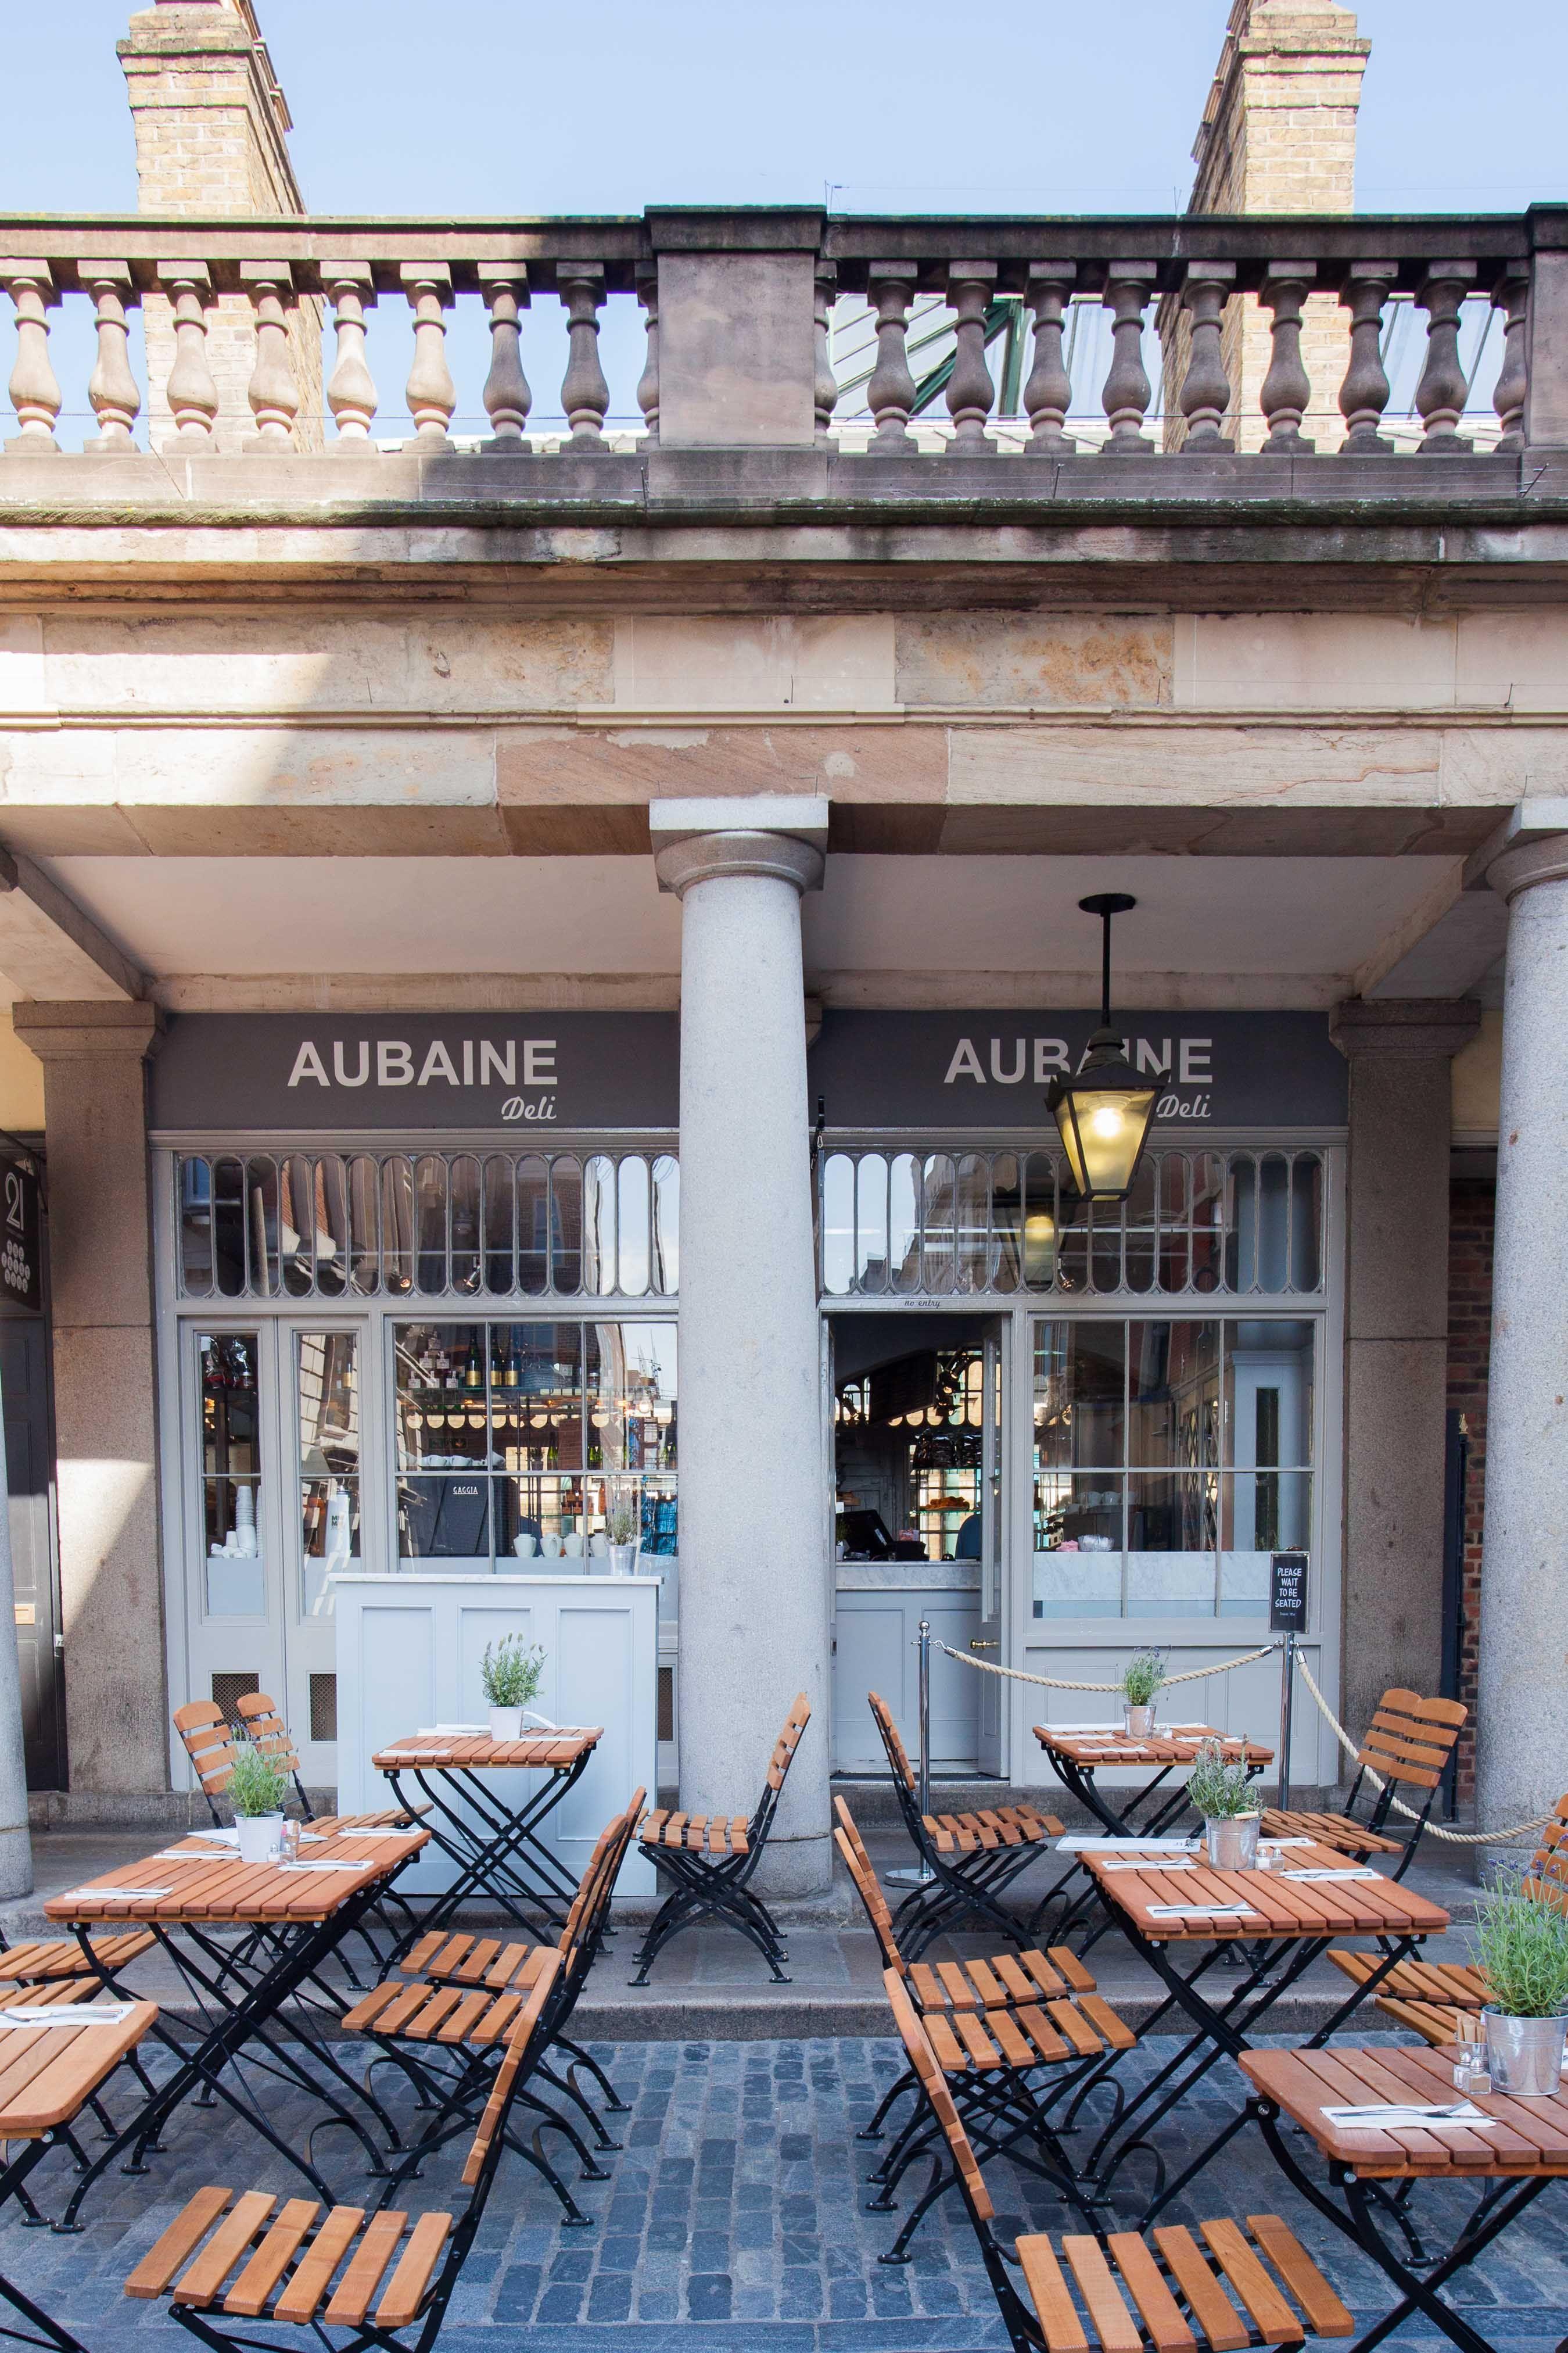 New menu alert! 📣 We have launched a new menu at Aubaine